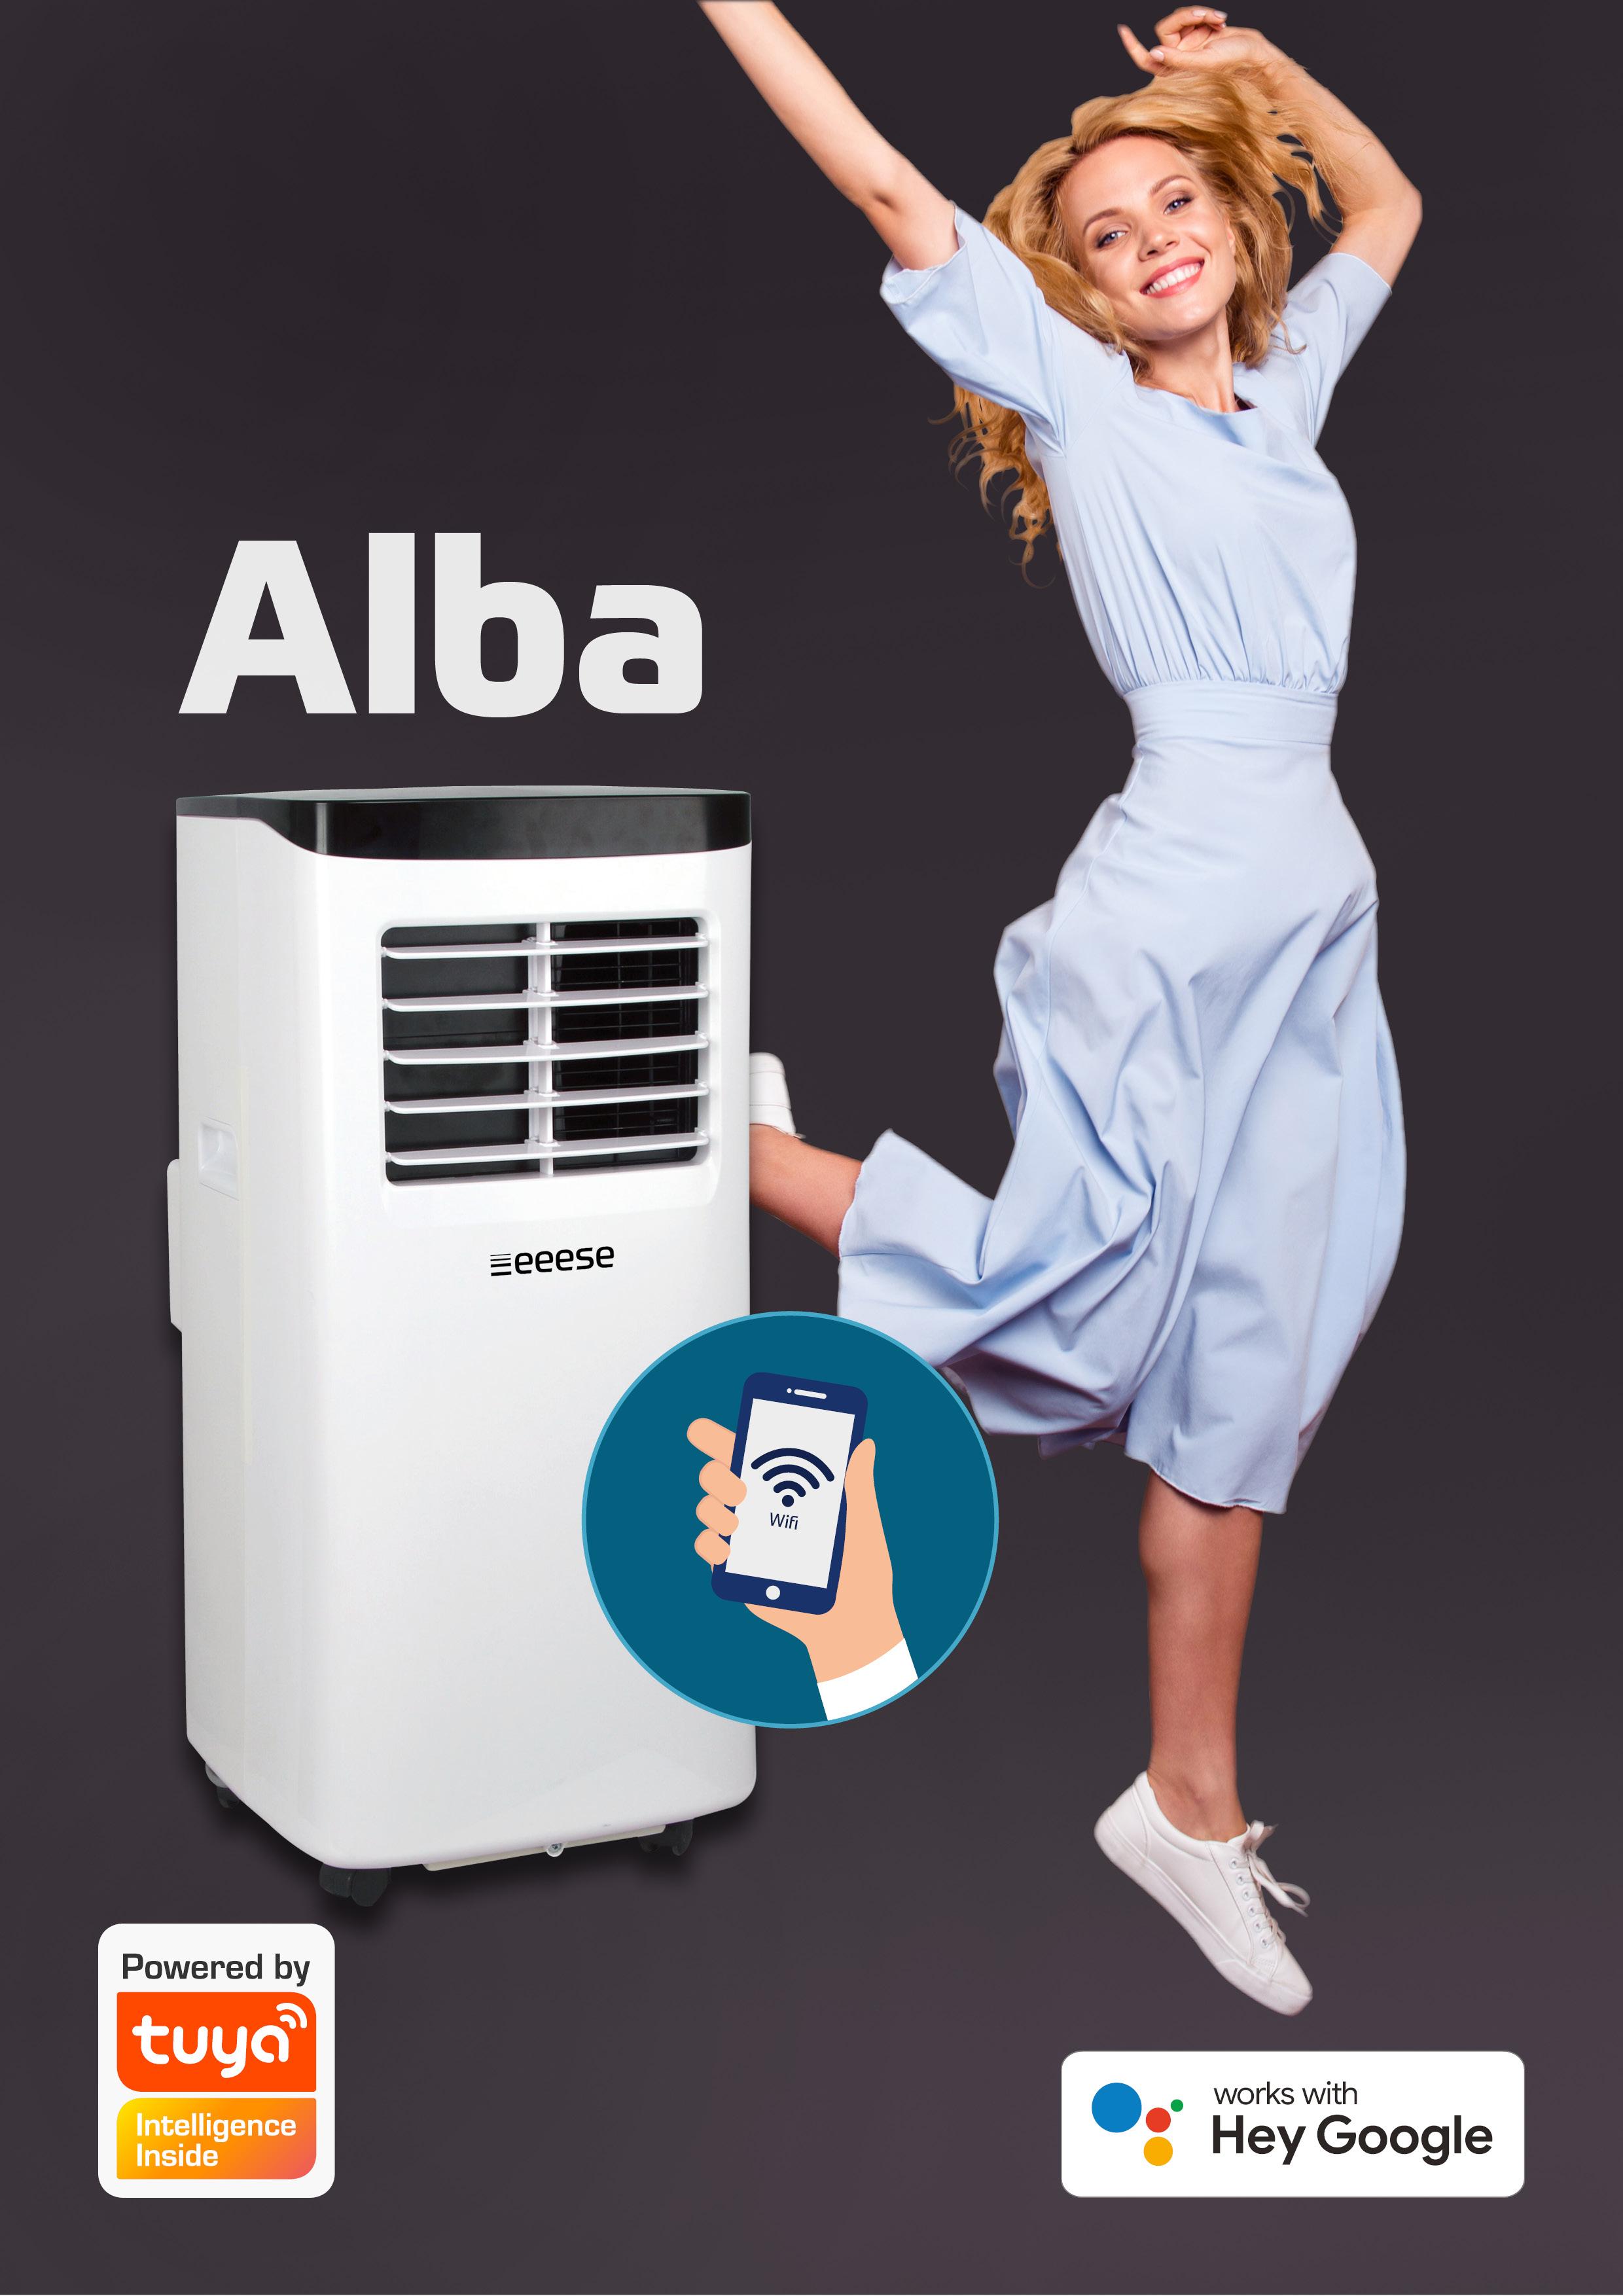 Alba 2-i-1 luftkonditionering och avfuktare – 20 m2 - Wifi, Google Assistant eeese